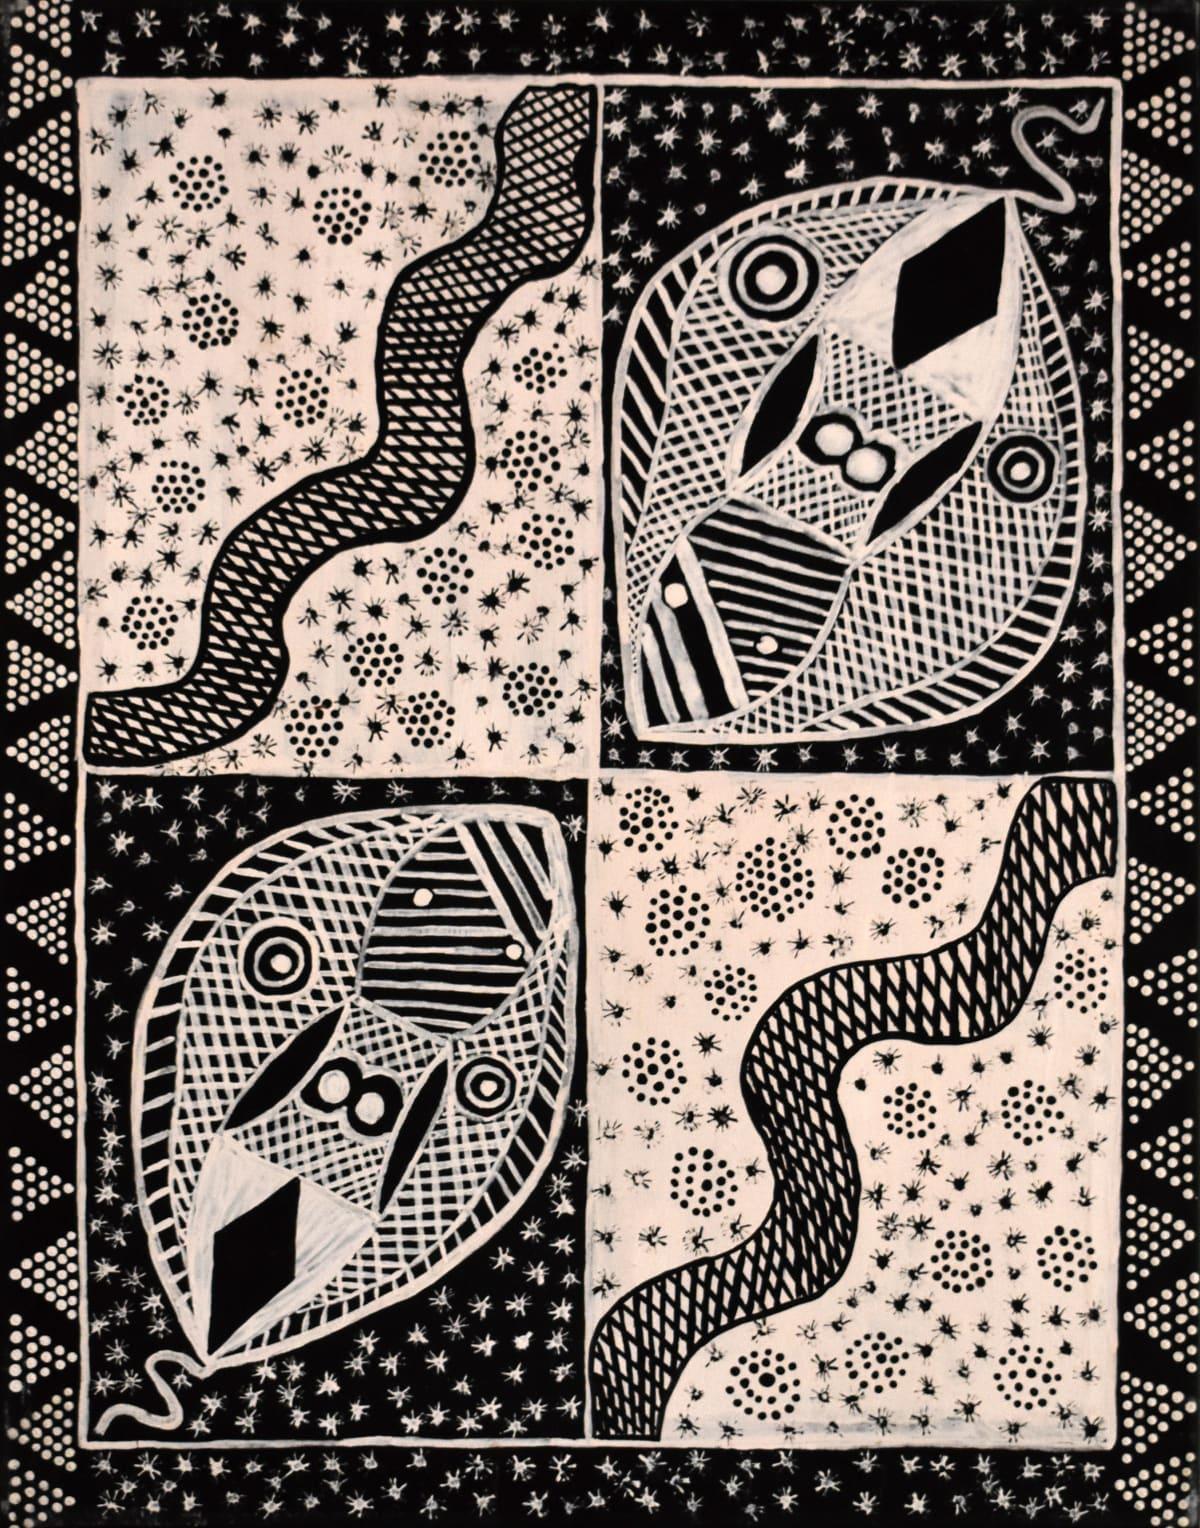 Samuel Scrubby Mantuwunjini (Dugong) amintiya jilamara natural ochres on canvas 70 x 90 cm